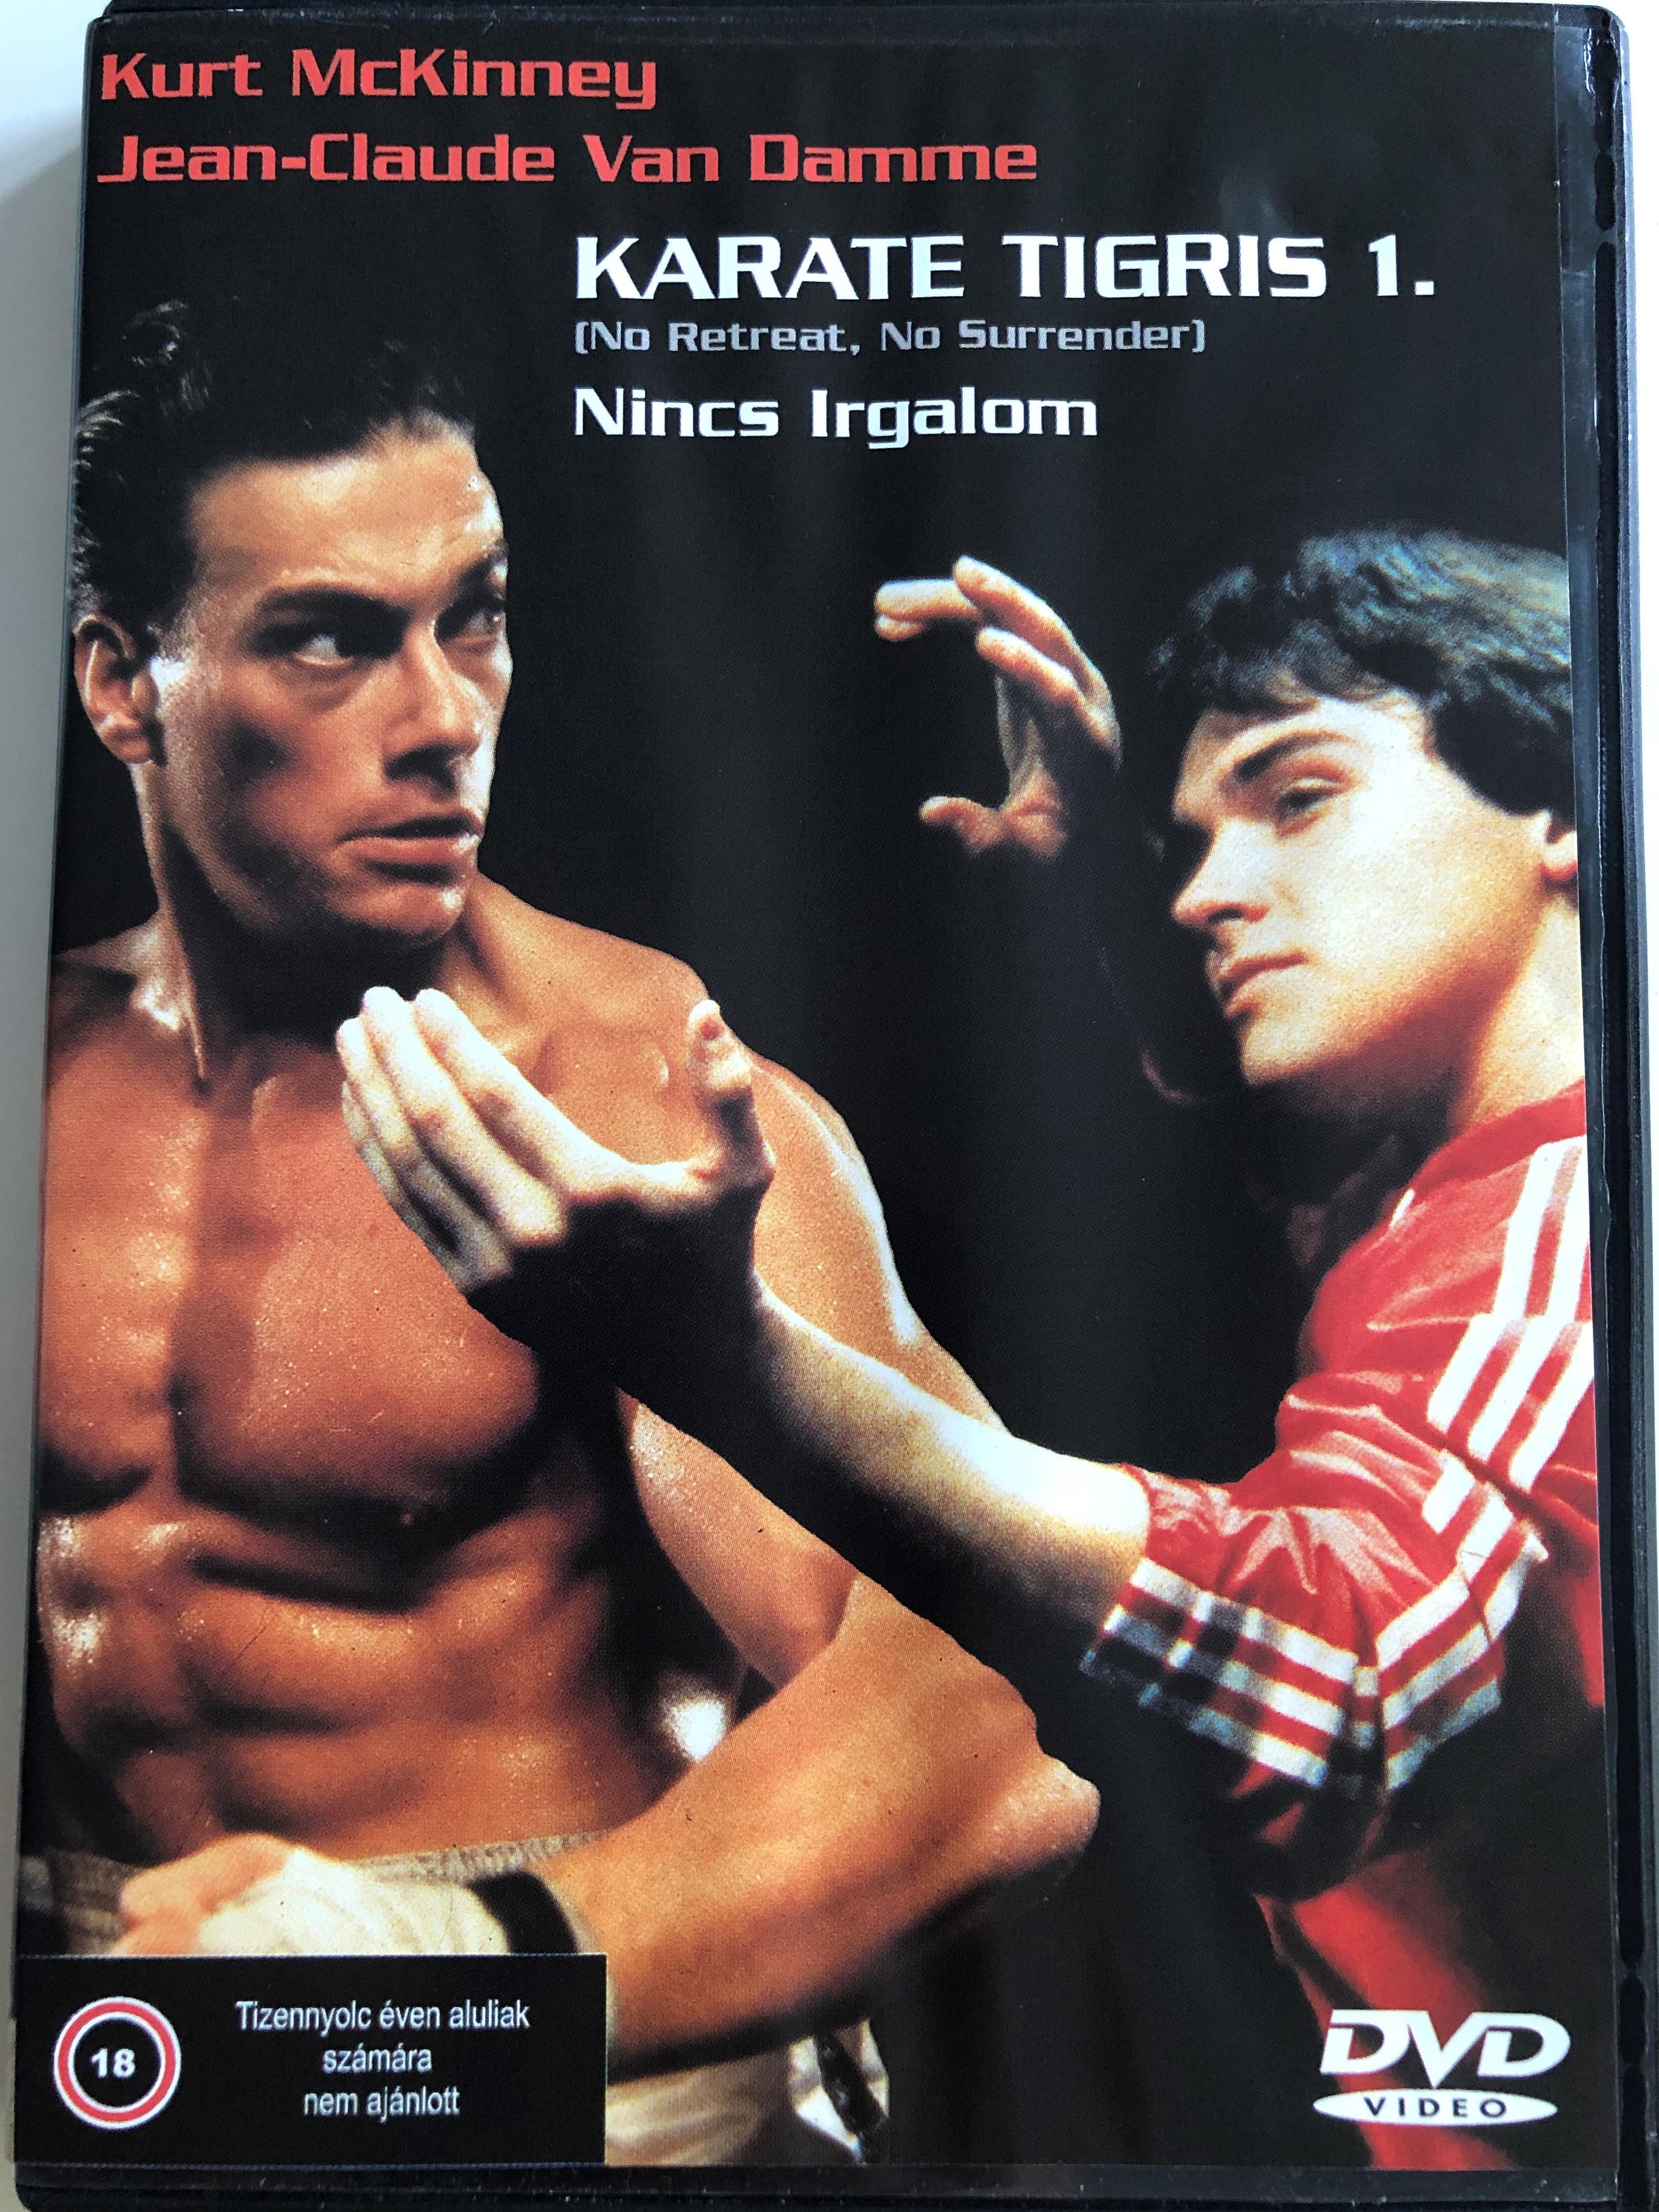 no-retreat-no-surrender-dvd-1985-karate-tigris-1.-nincs-irgalom-directed-by-corey-youen-starring-kurt-mckinney-jean-claude-van-damme-1-.jpg